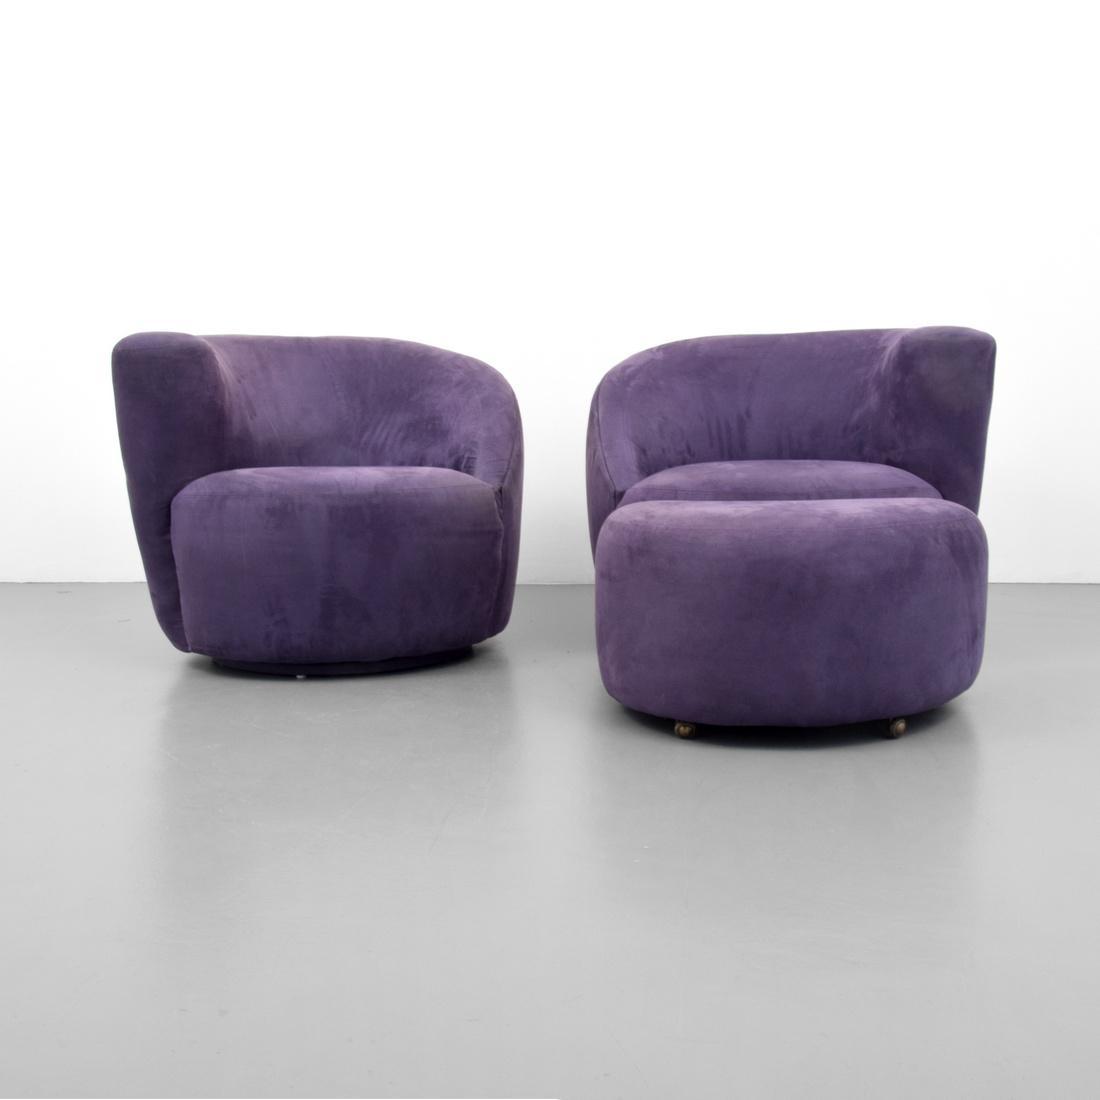 Elegant Vladimir Kagan CORKSCREW Swivel Chairs U0026 Ottoman